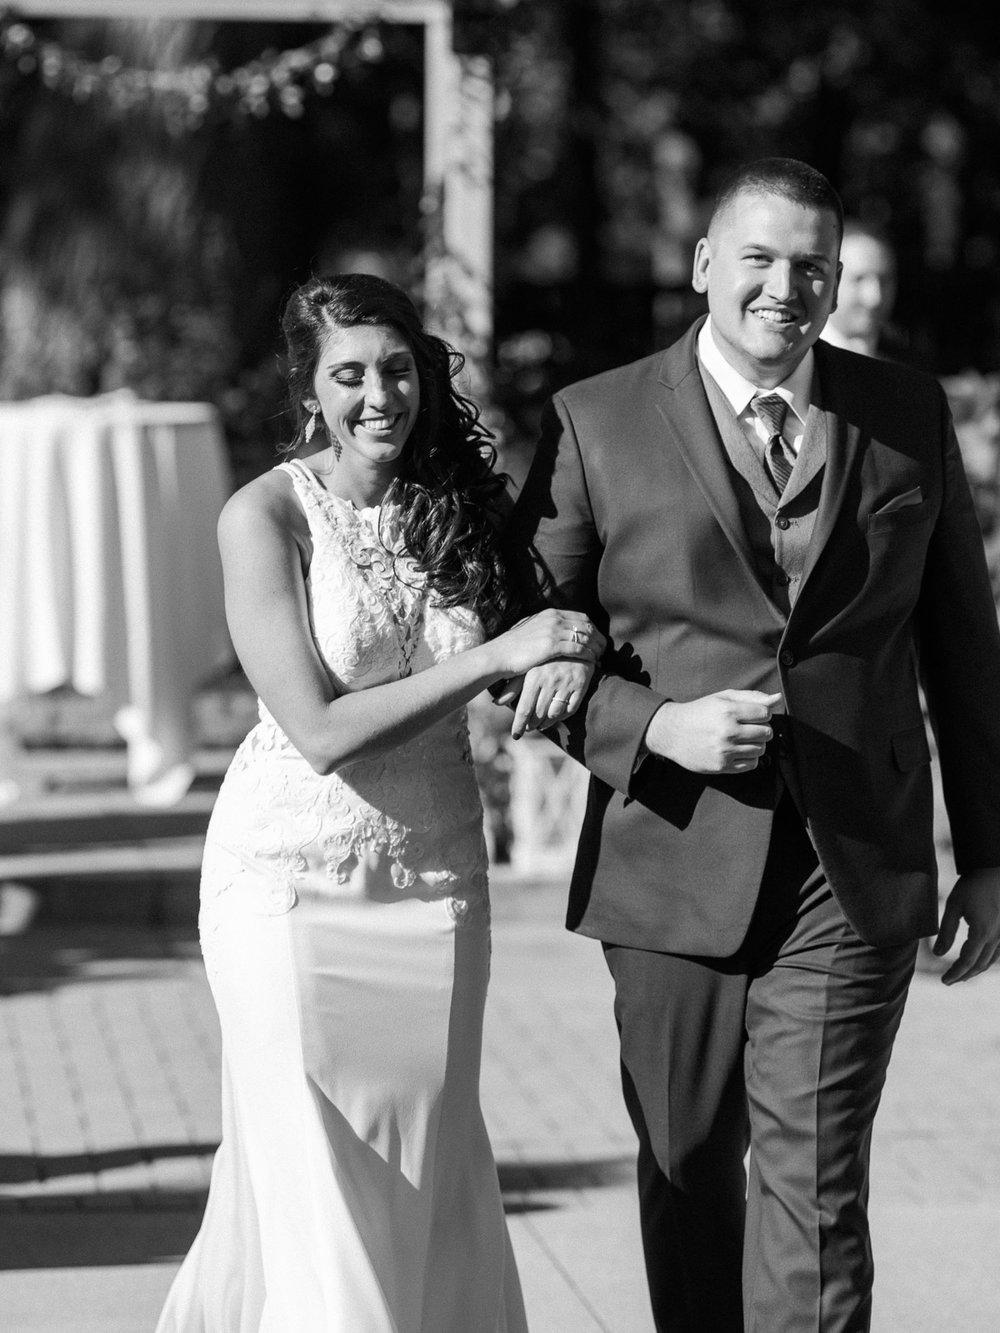 elegant-hoover-hall-wedding-photos-by-matt-erickson-photography-9.jpg